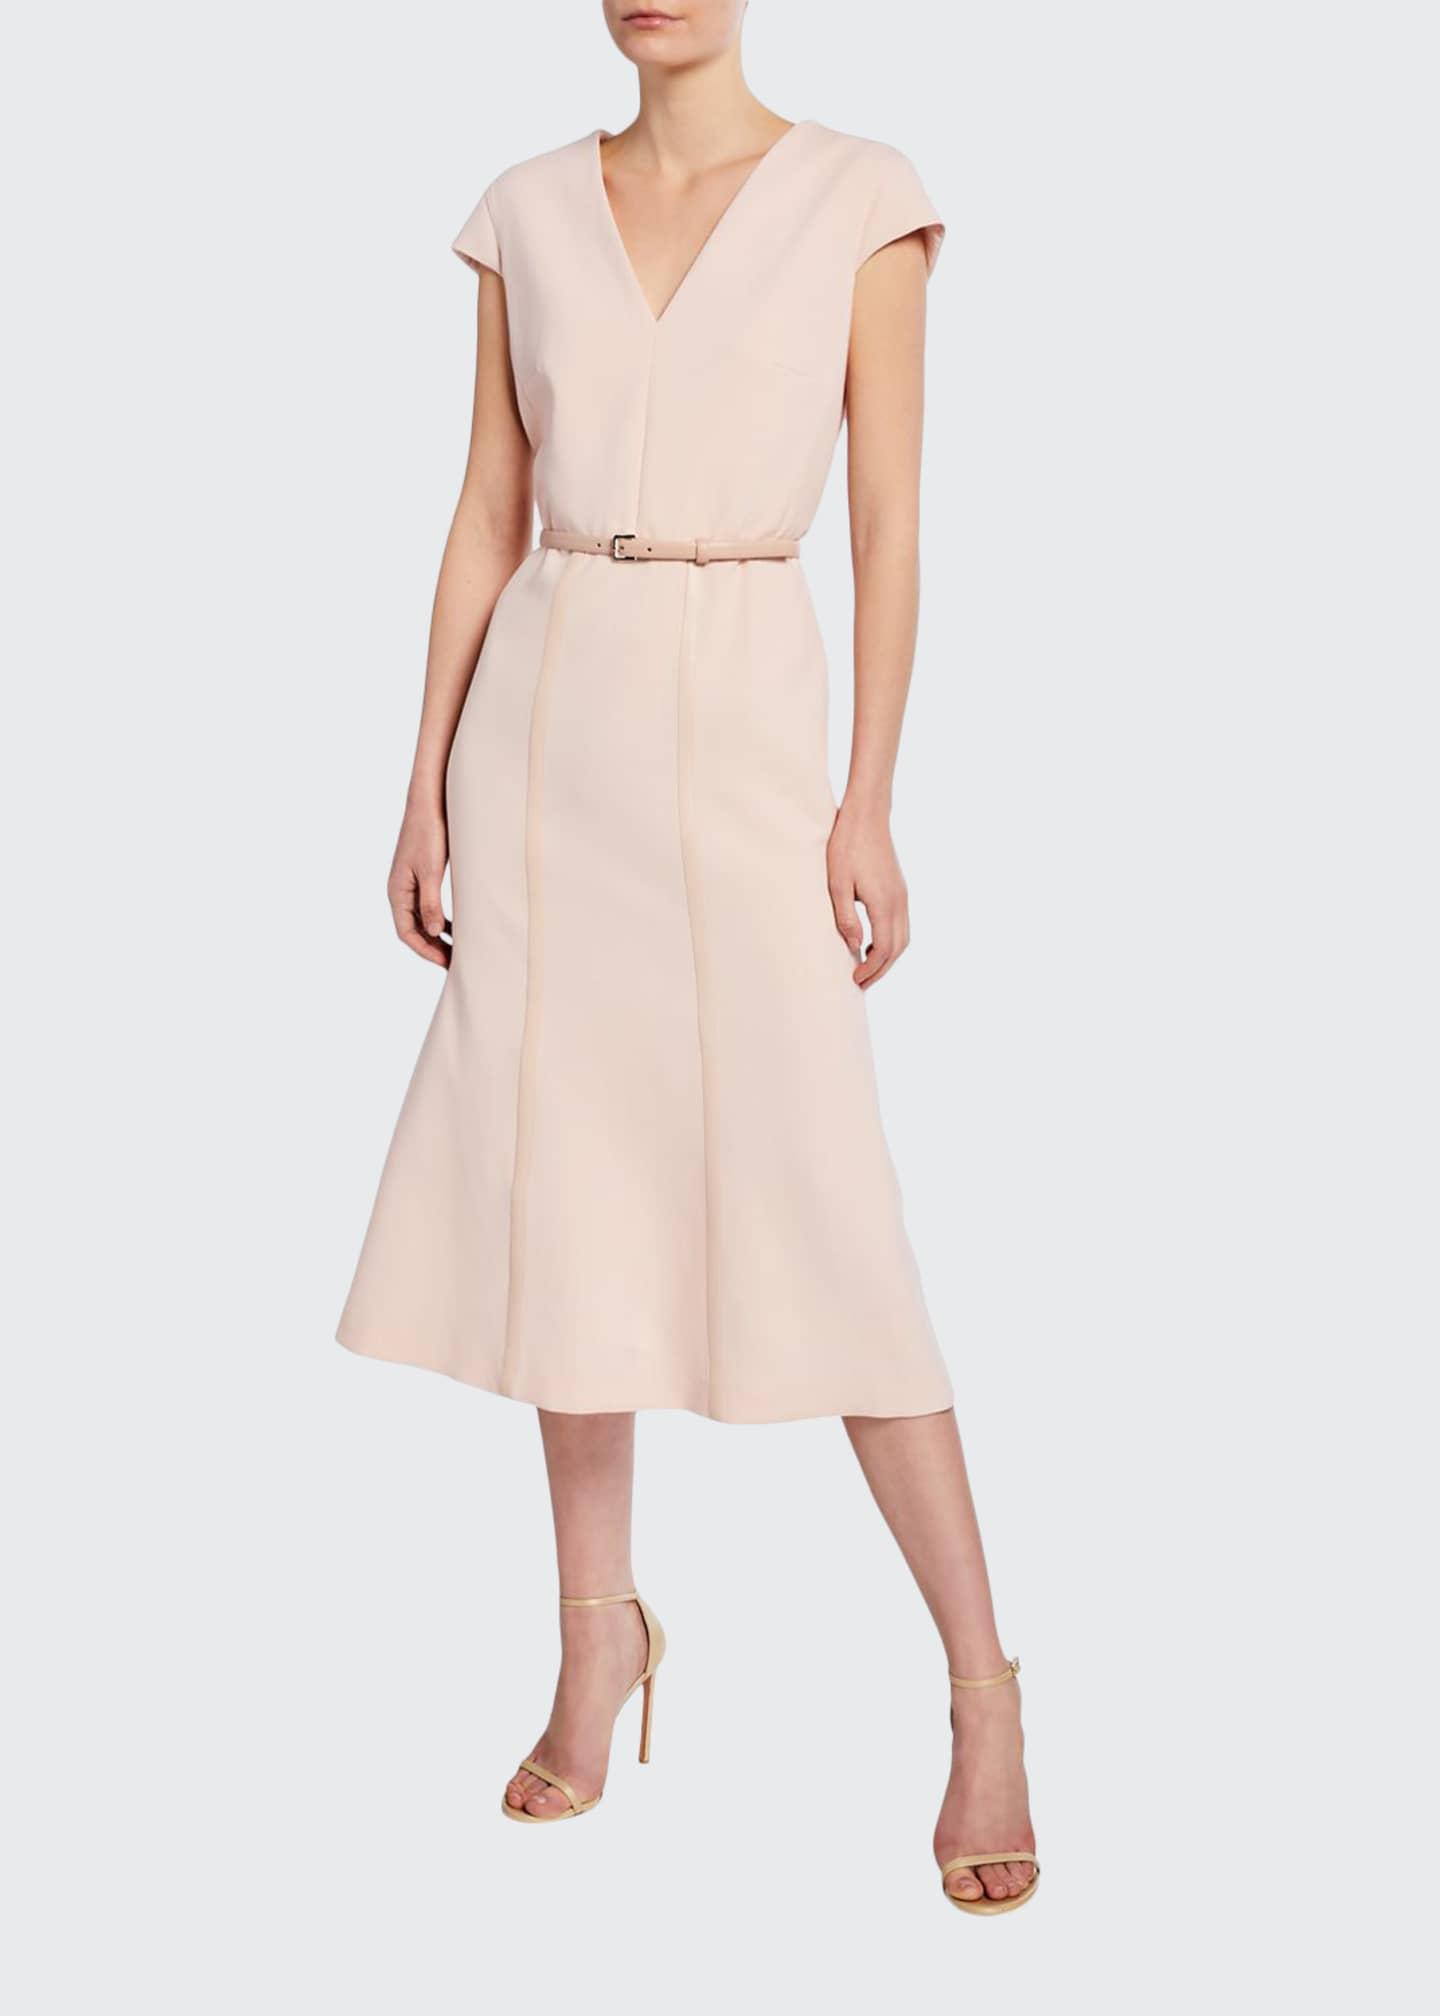 Maxmara Giberna Cap-Sleeve Belted Dress